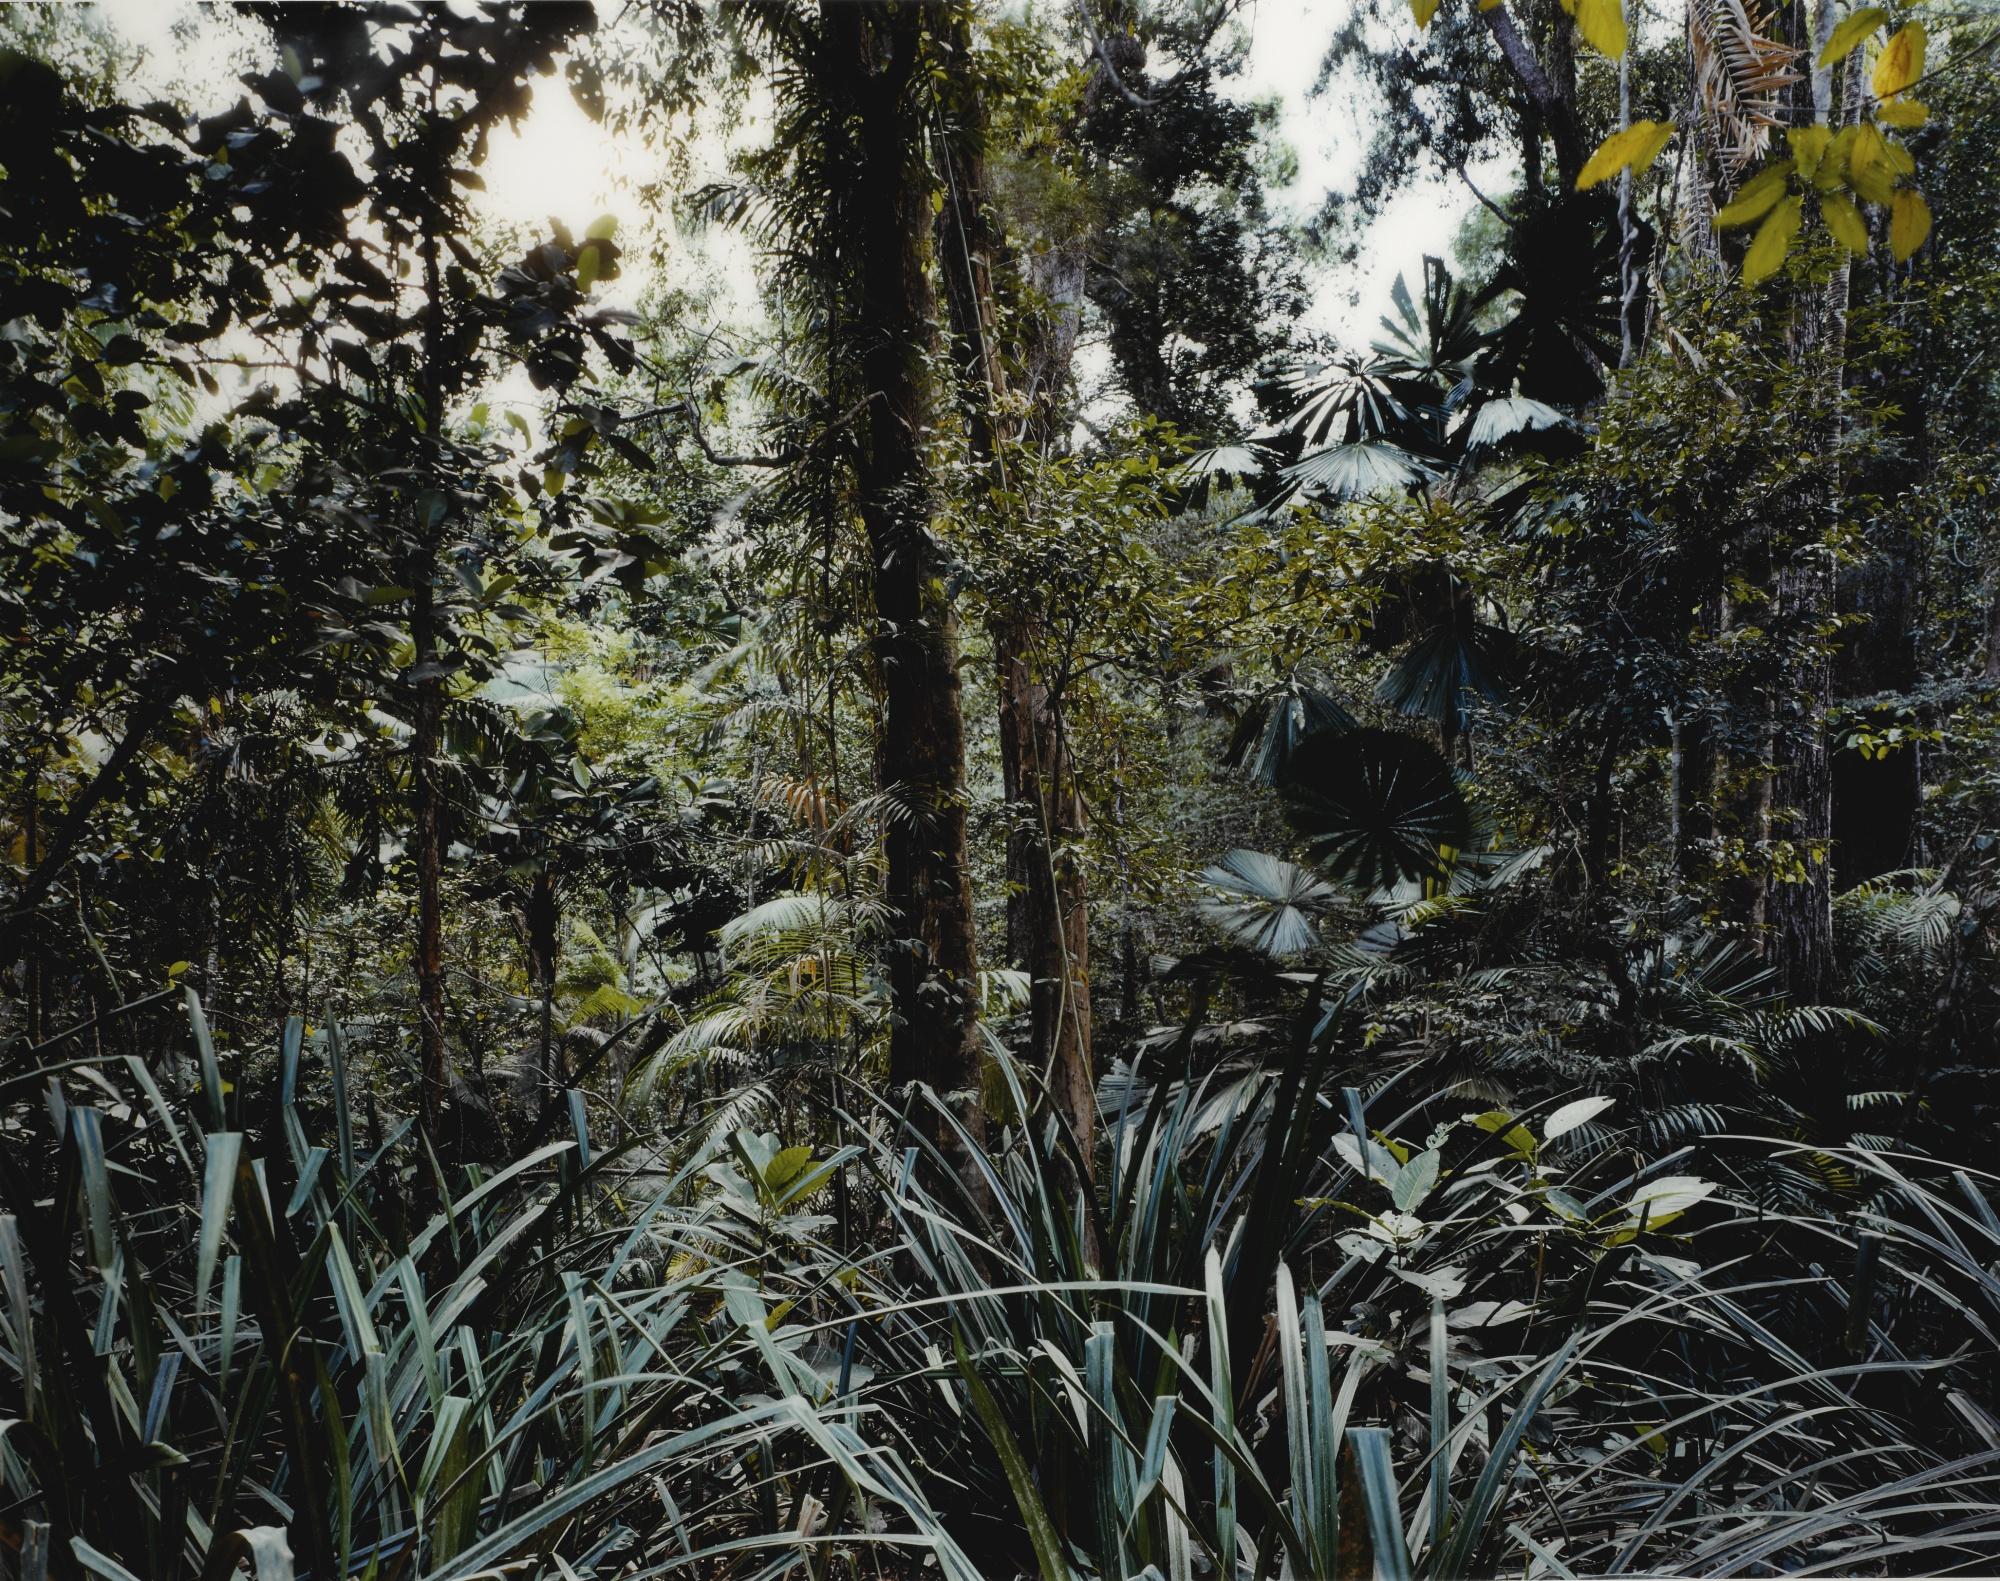 Thomas Struth Paradise-7 Daintree Australia 1998